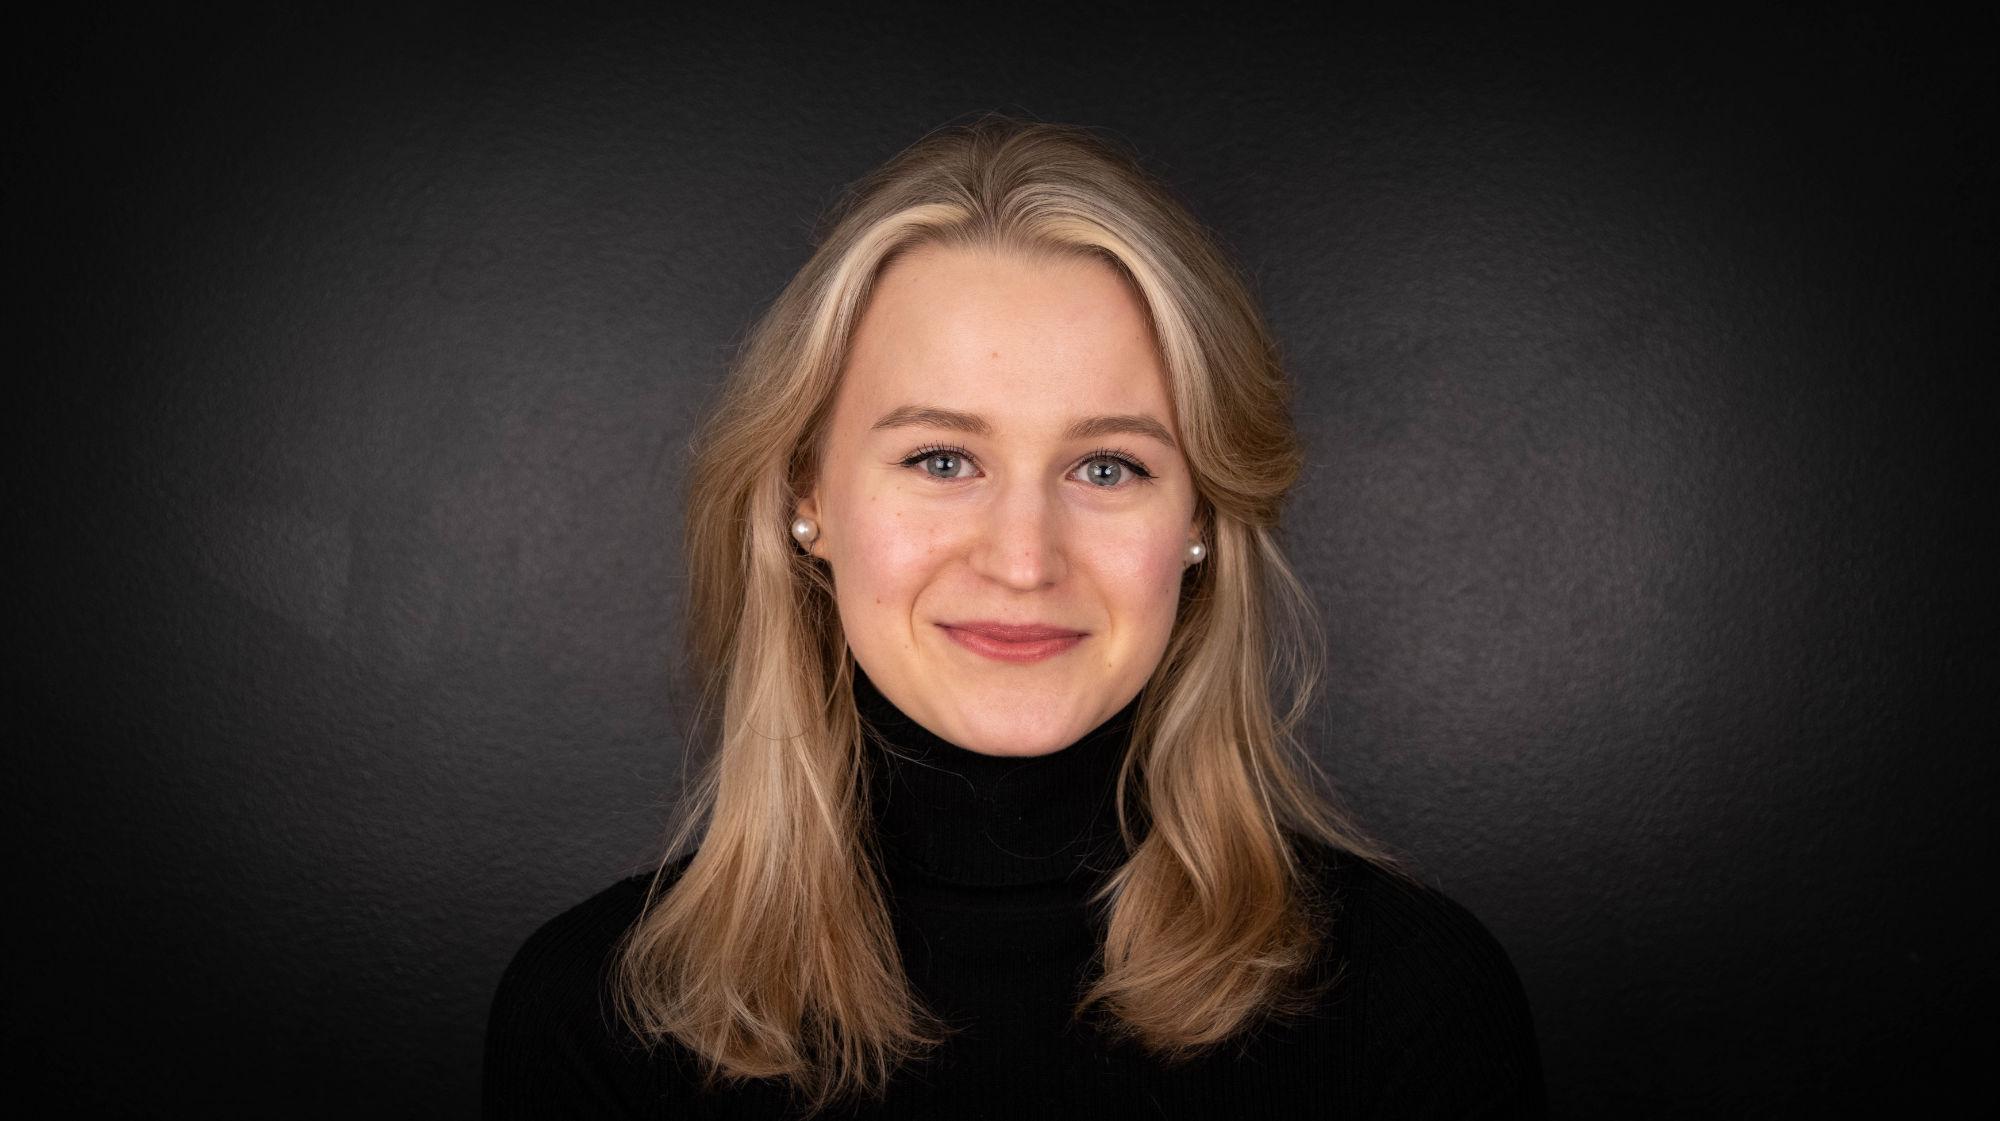 A picture of Anniina Könönen